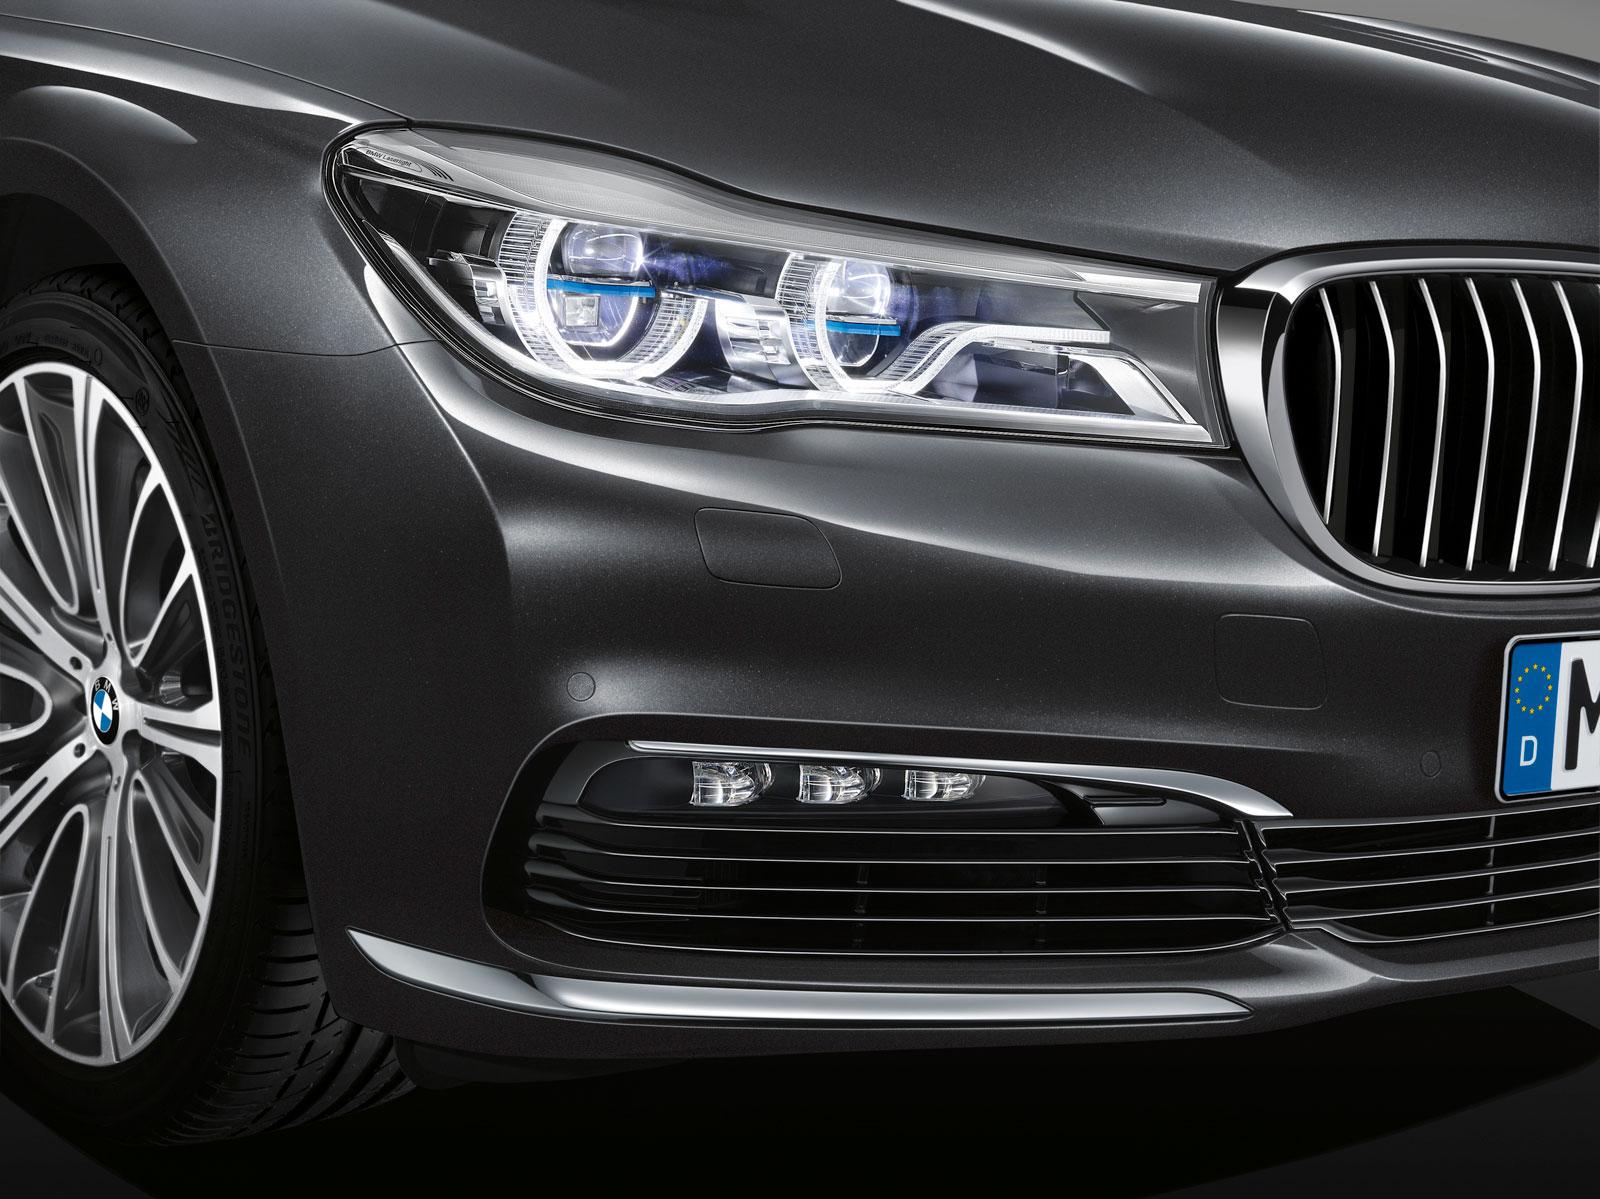 Bmw 7 Series Headlight Car Body Design